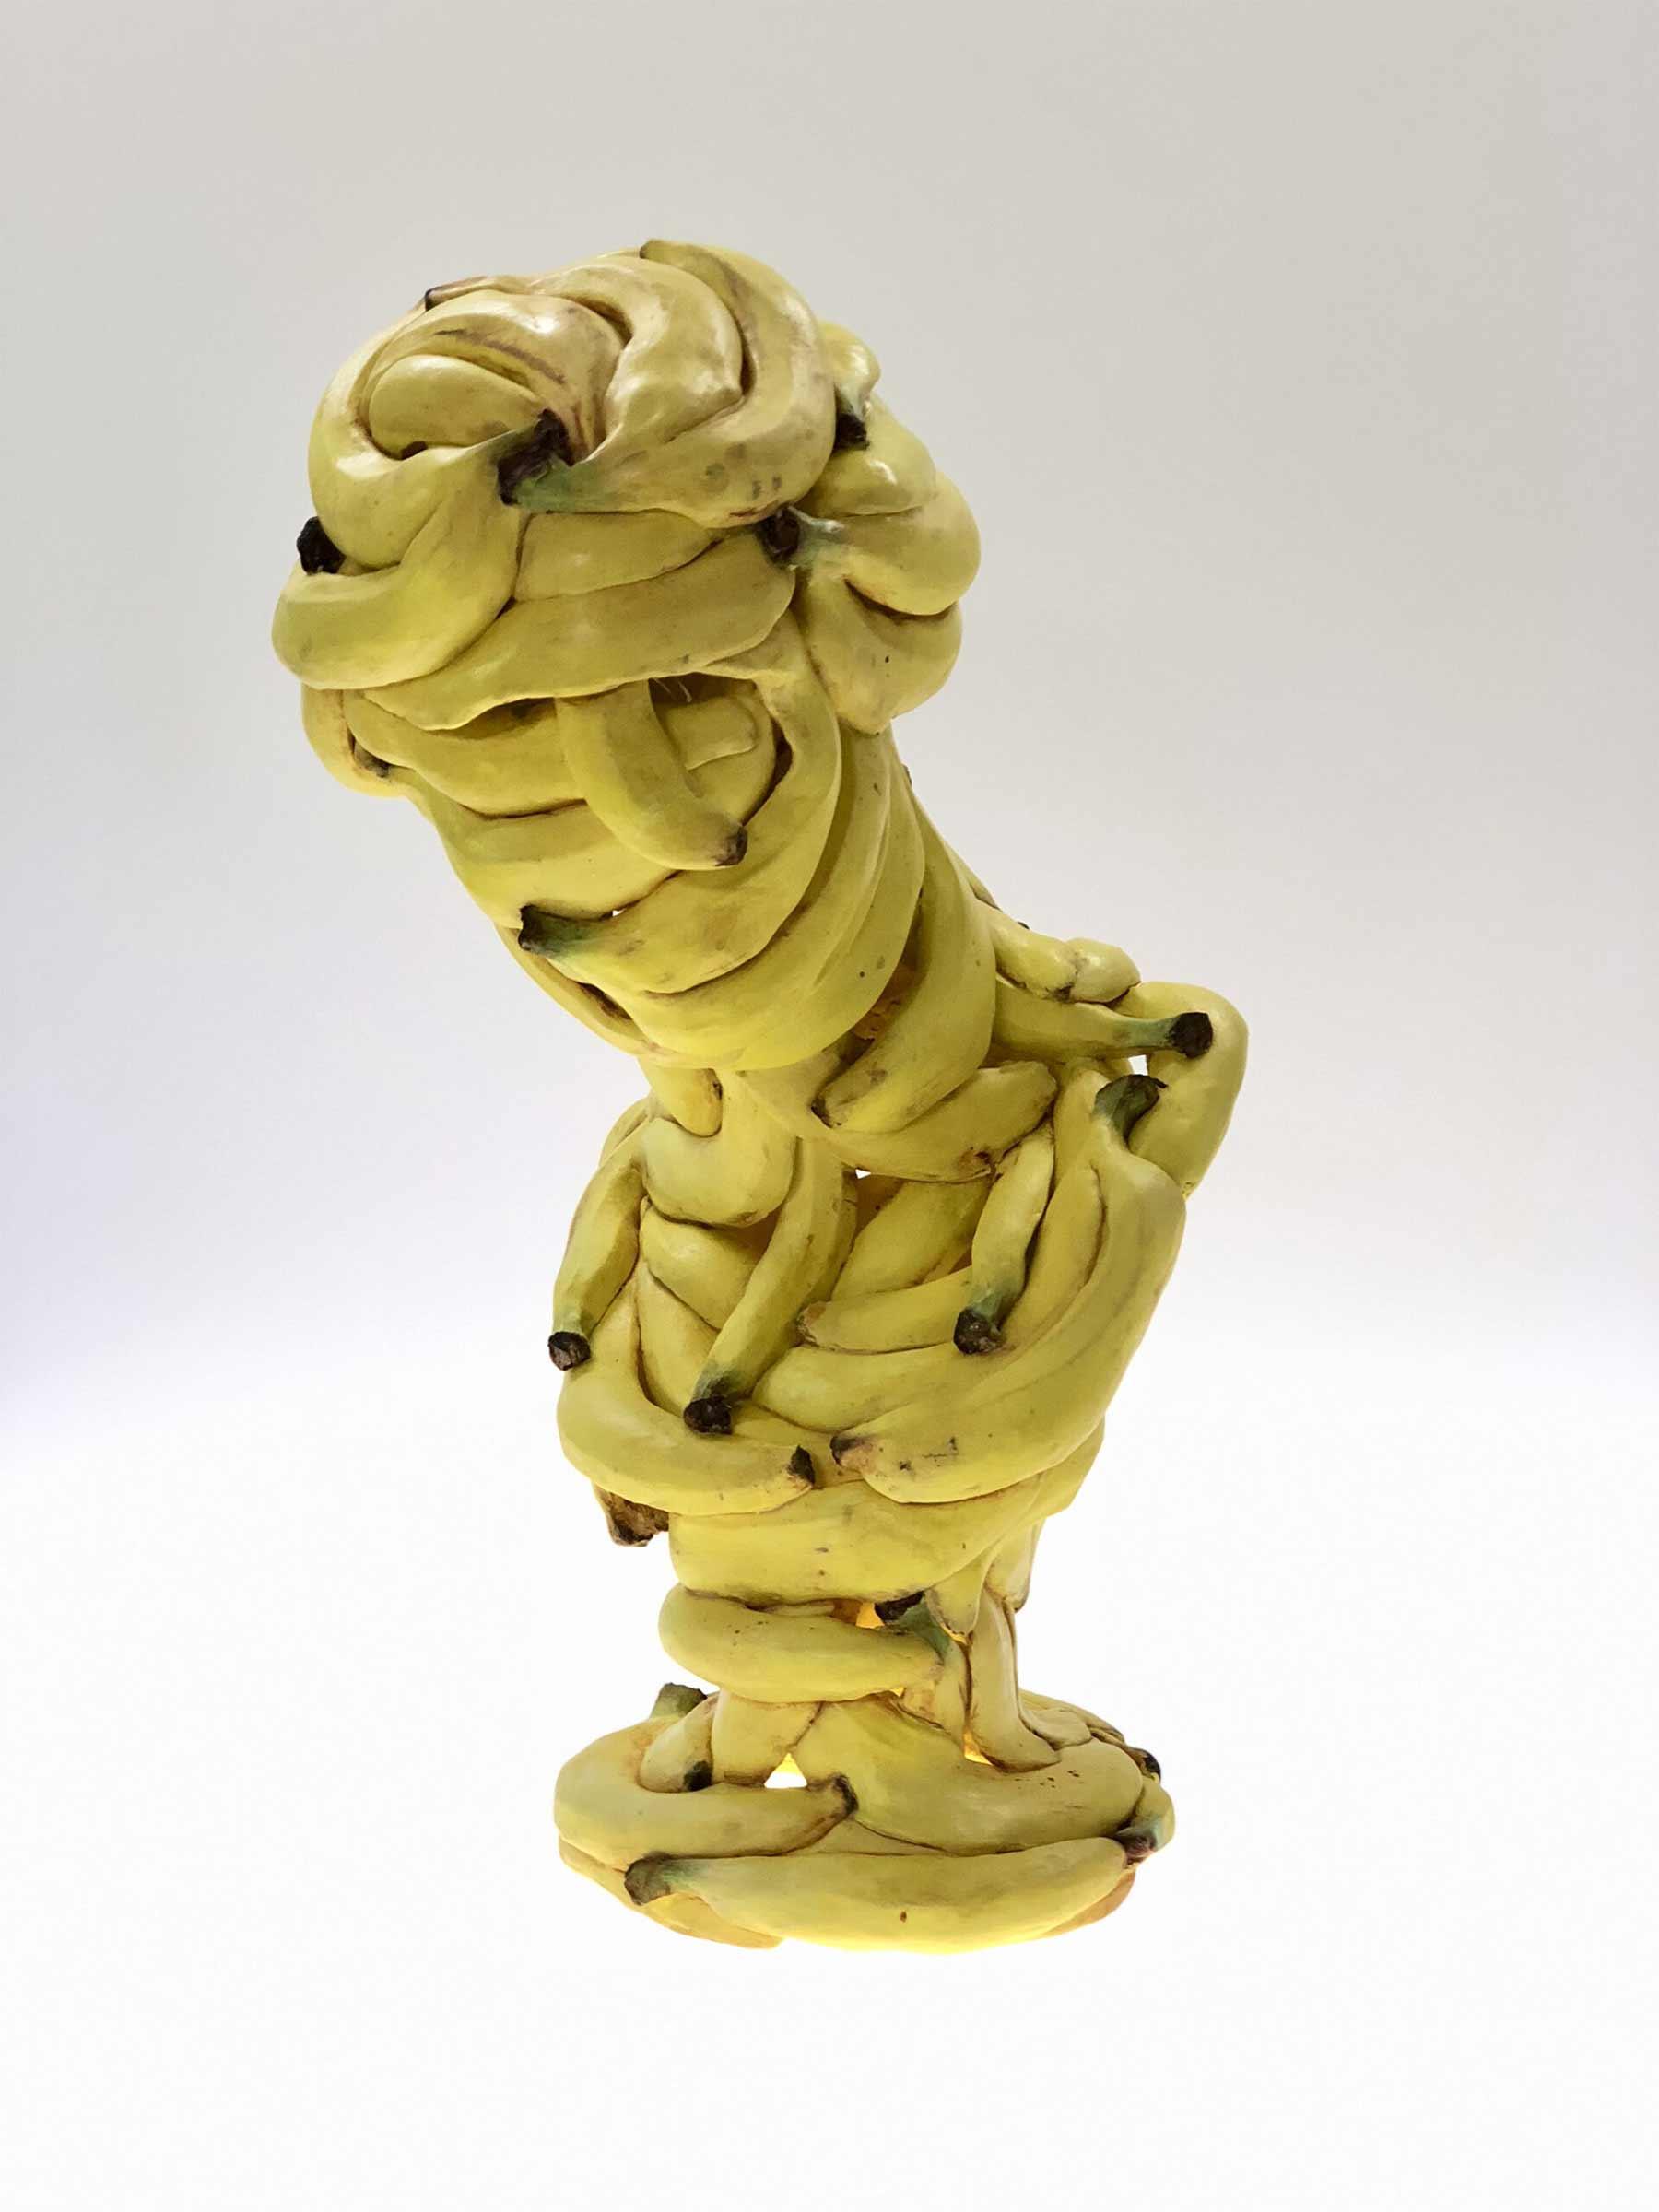 Bananen-Skulpturen von Koji Kasatani Koji-Kasatani-bananenskulpturen_01